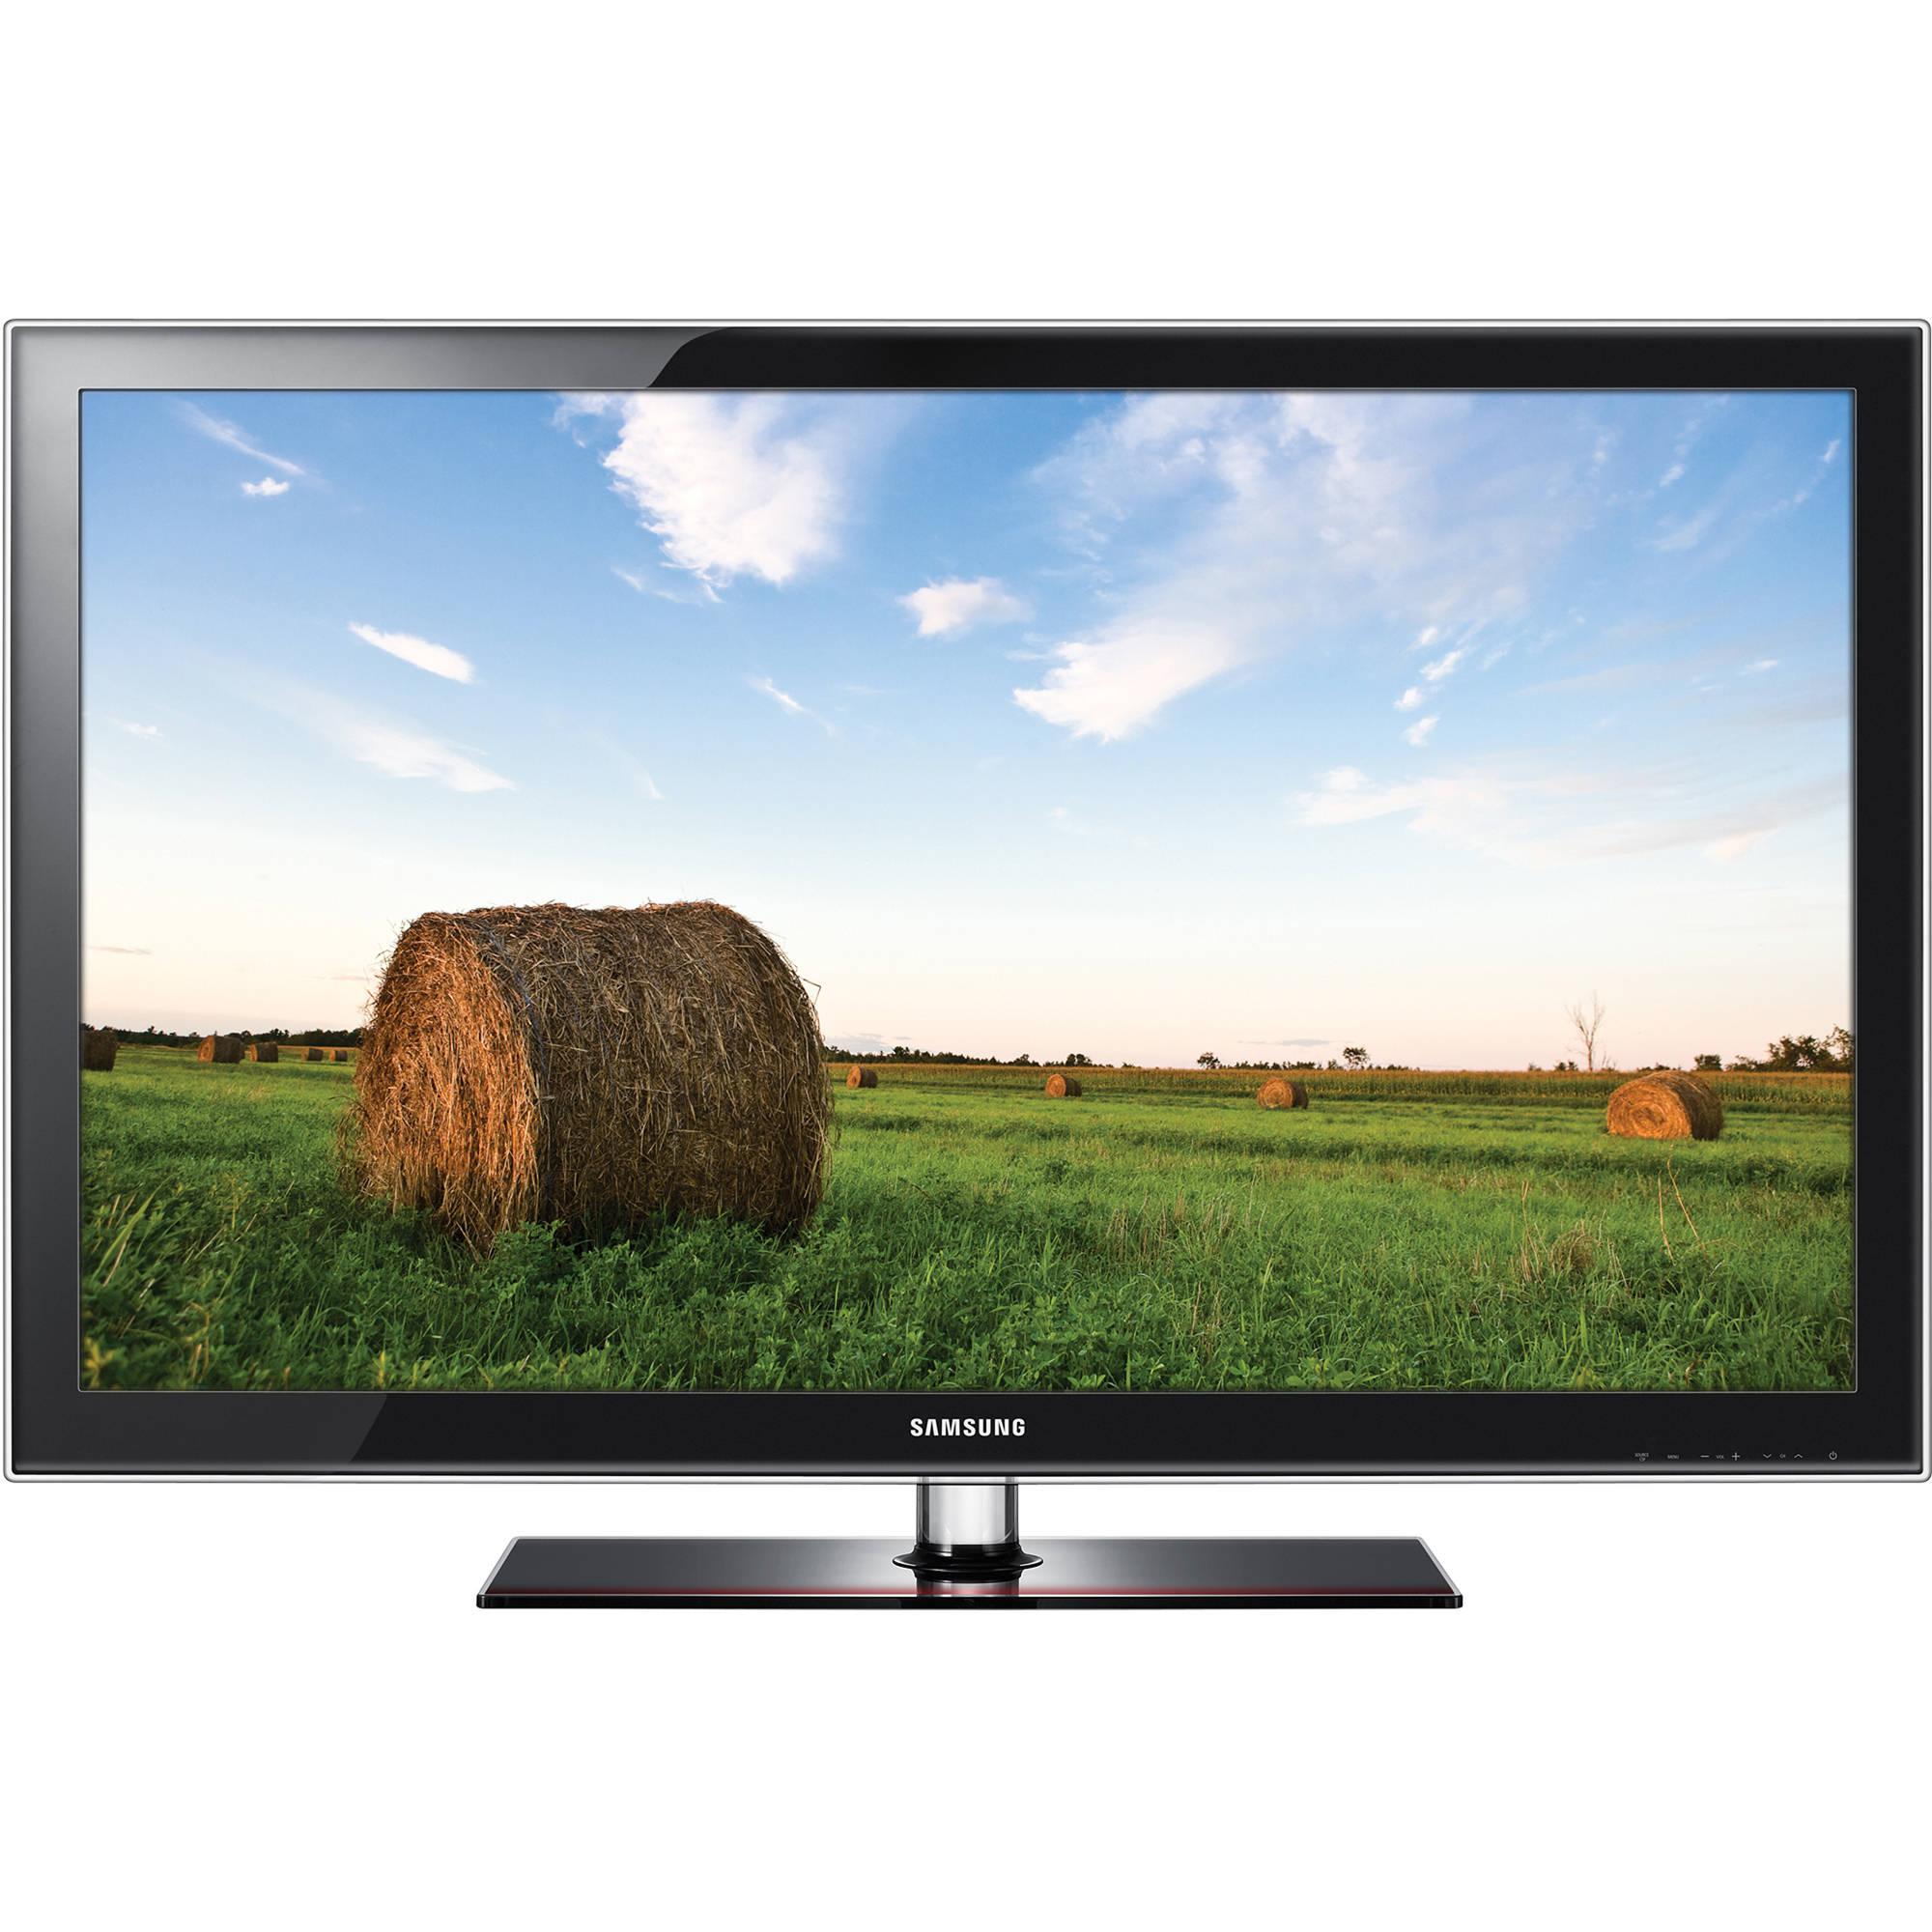 Samsung Ln46c630 46 Lcd Hdtv Ln46c630k1fxza Bh Photo Circuit Board For Tv